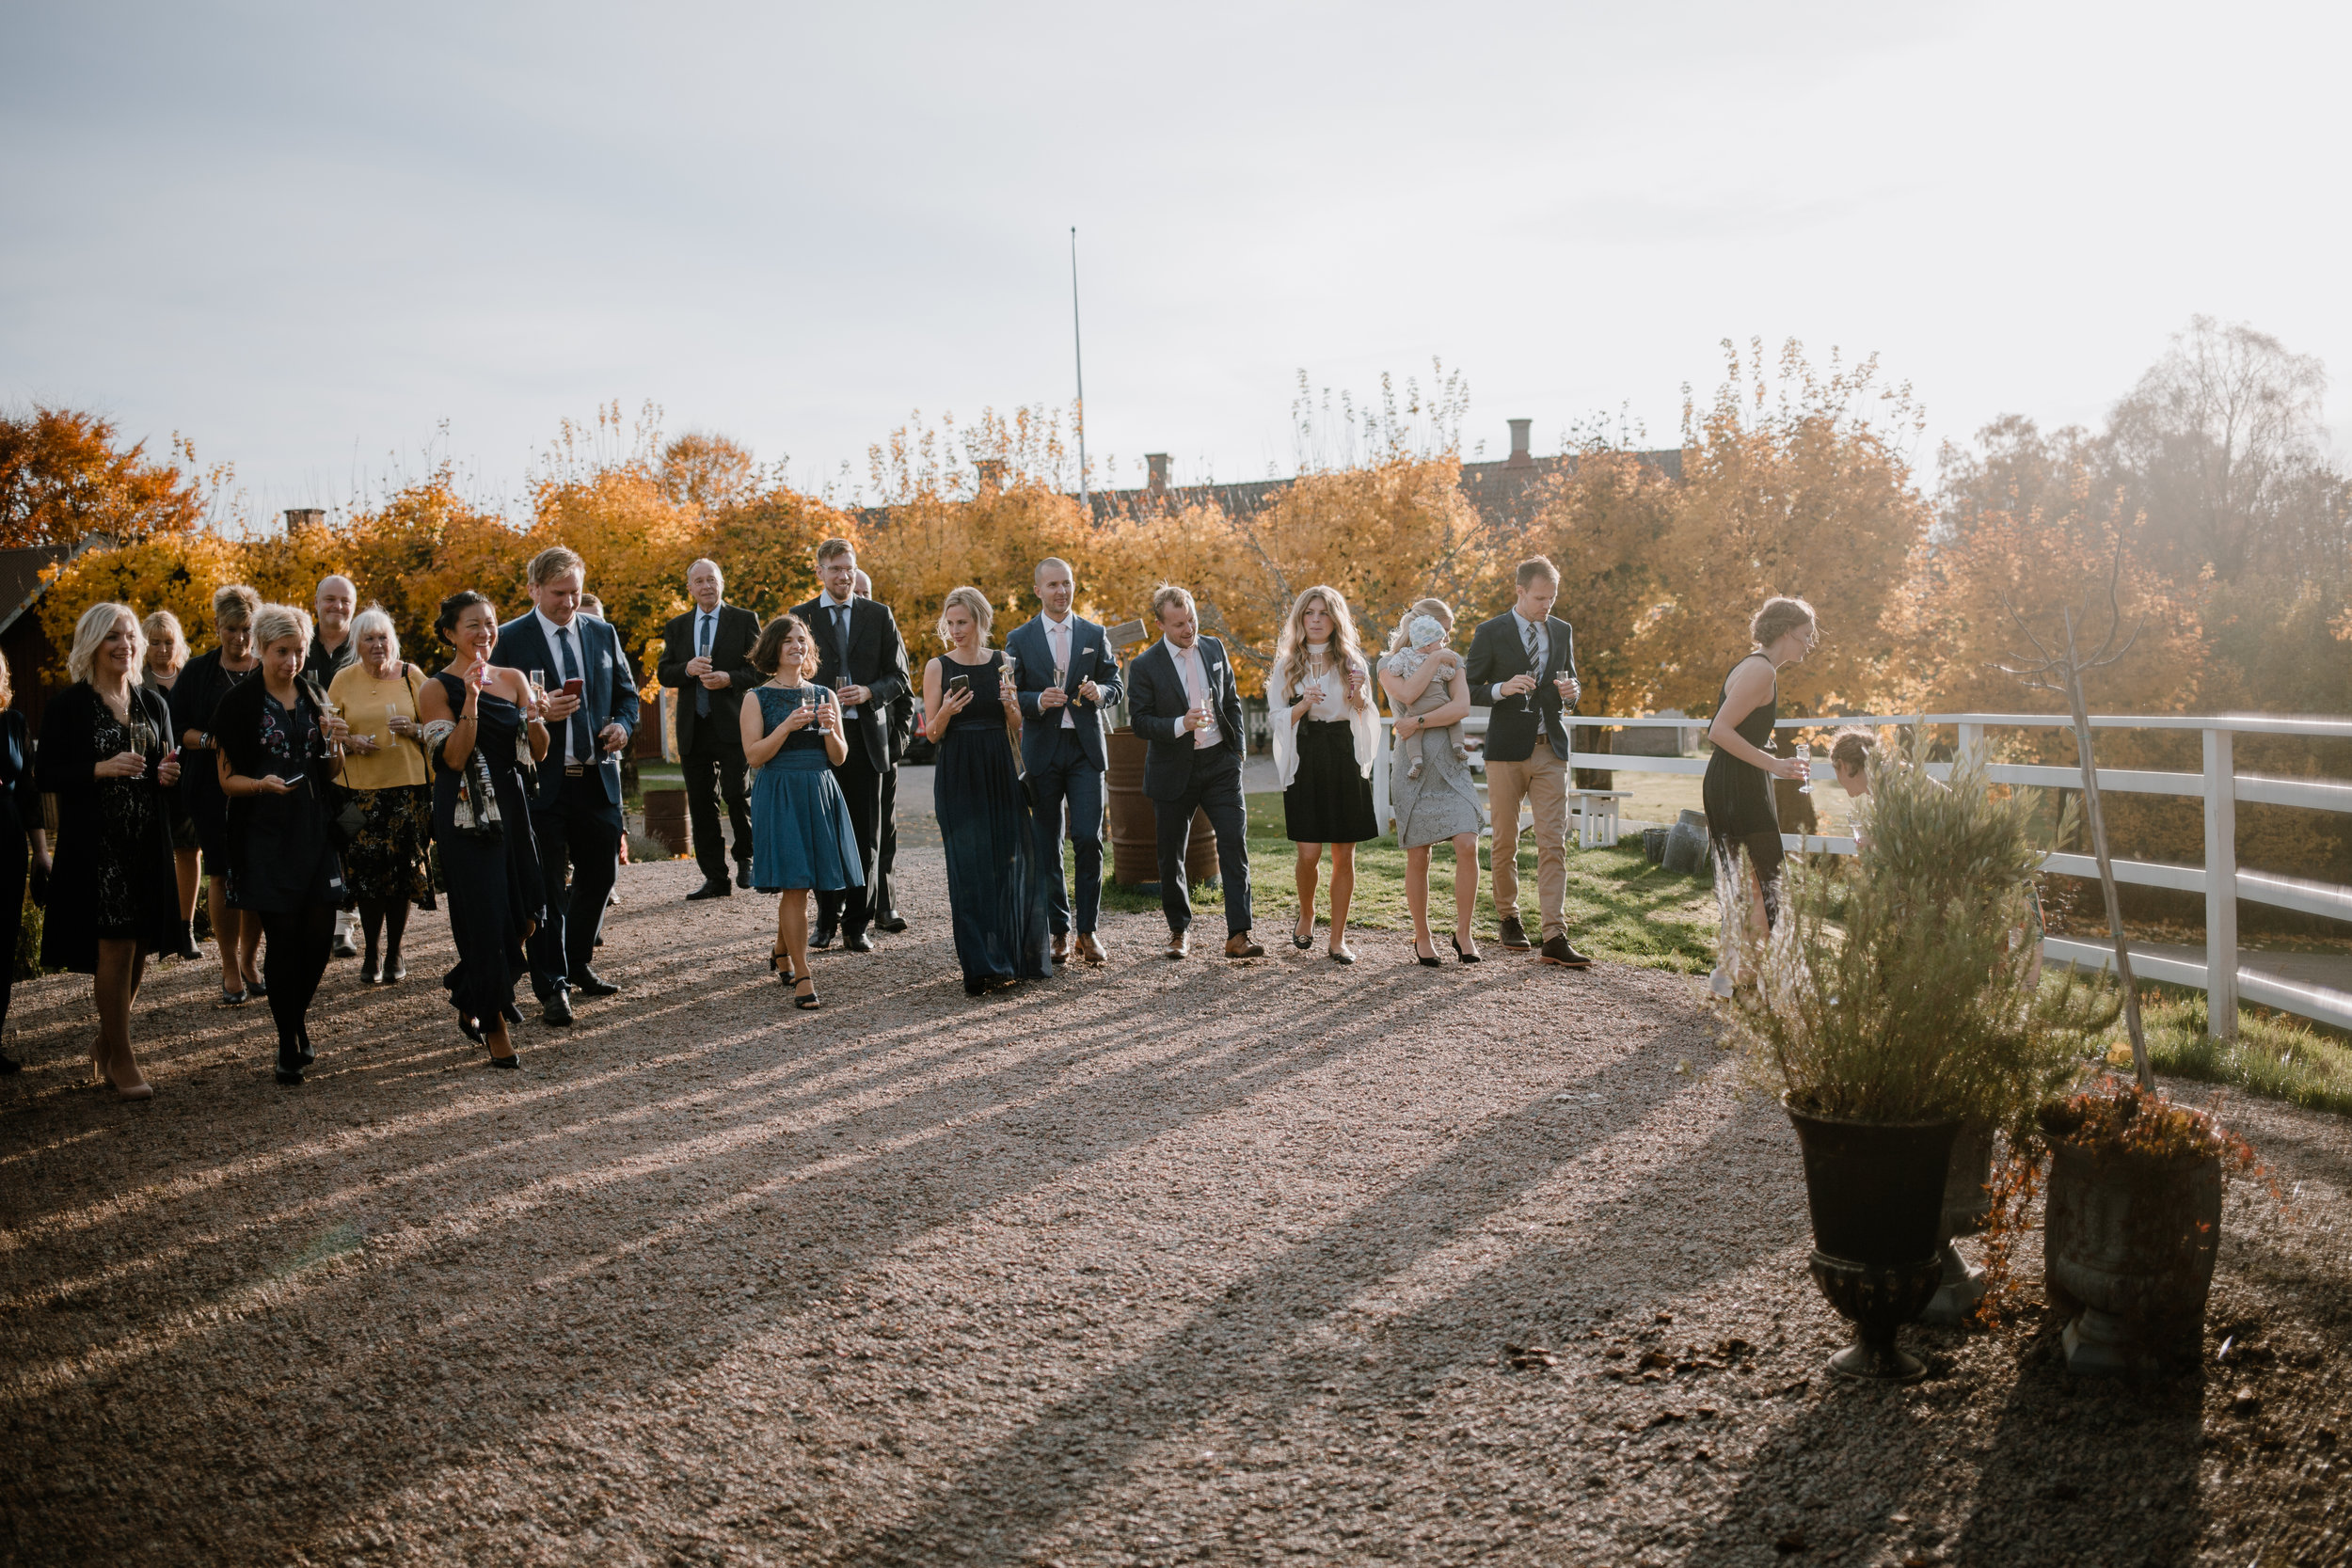 Bröllopsfotograf-Uddetorp Säteri-Höstbröllop-Fotograf Emilia- Bröllopsfotograf Borås-49.jpg